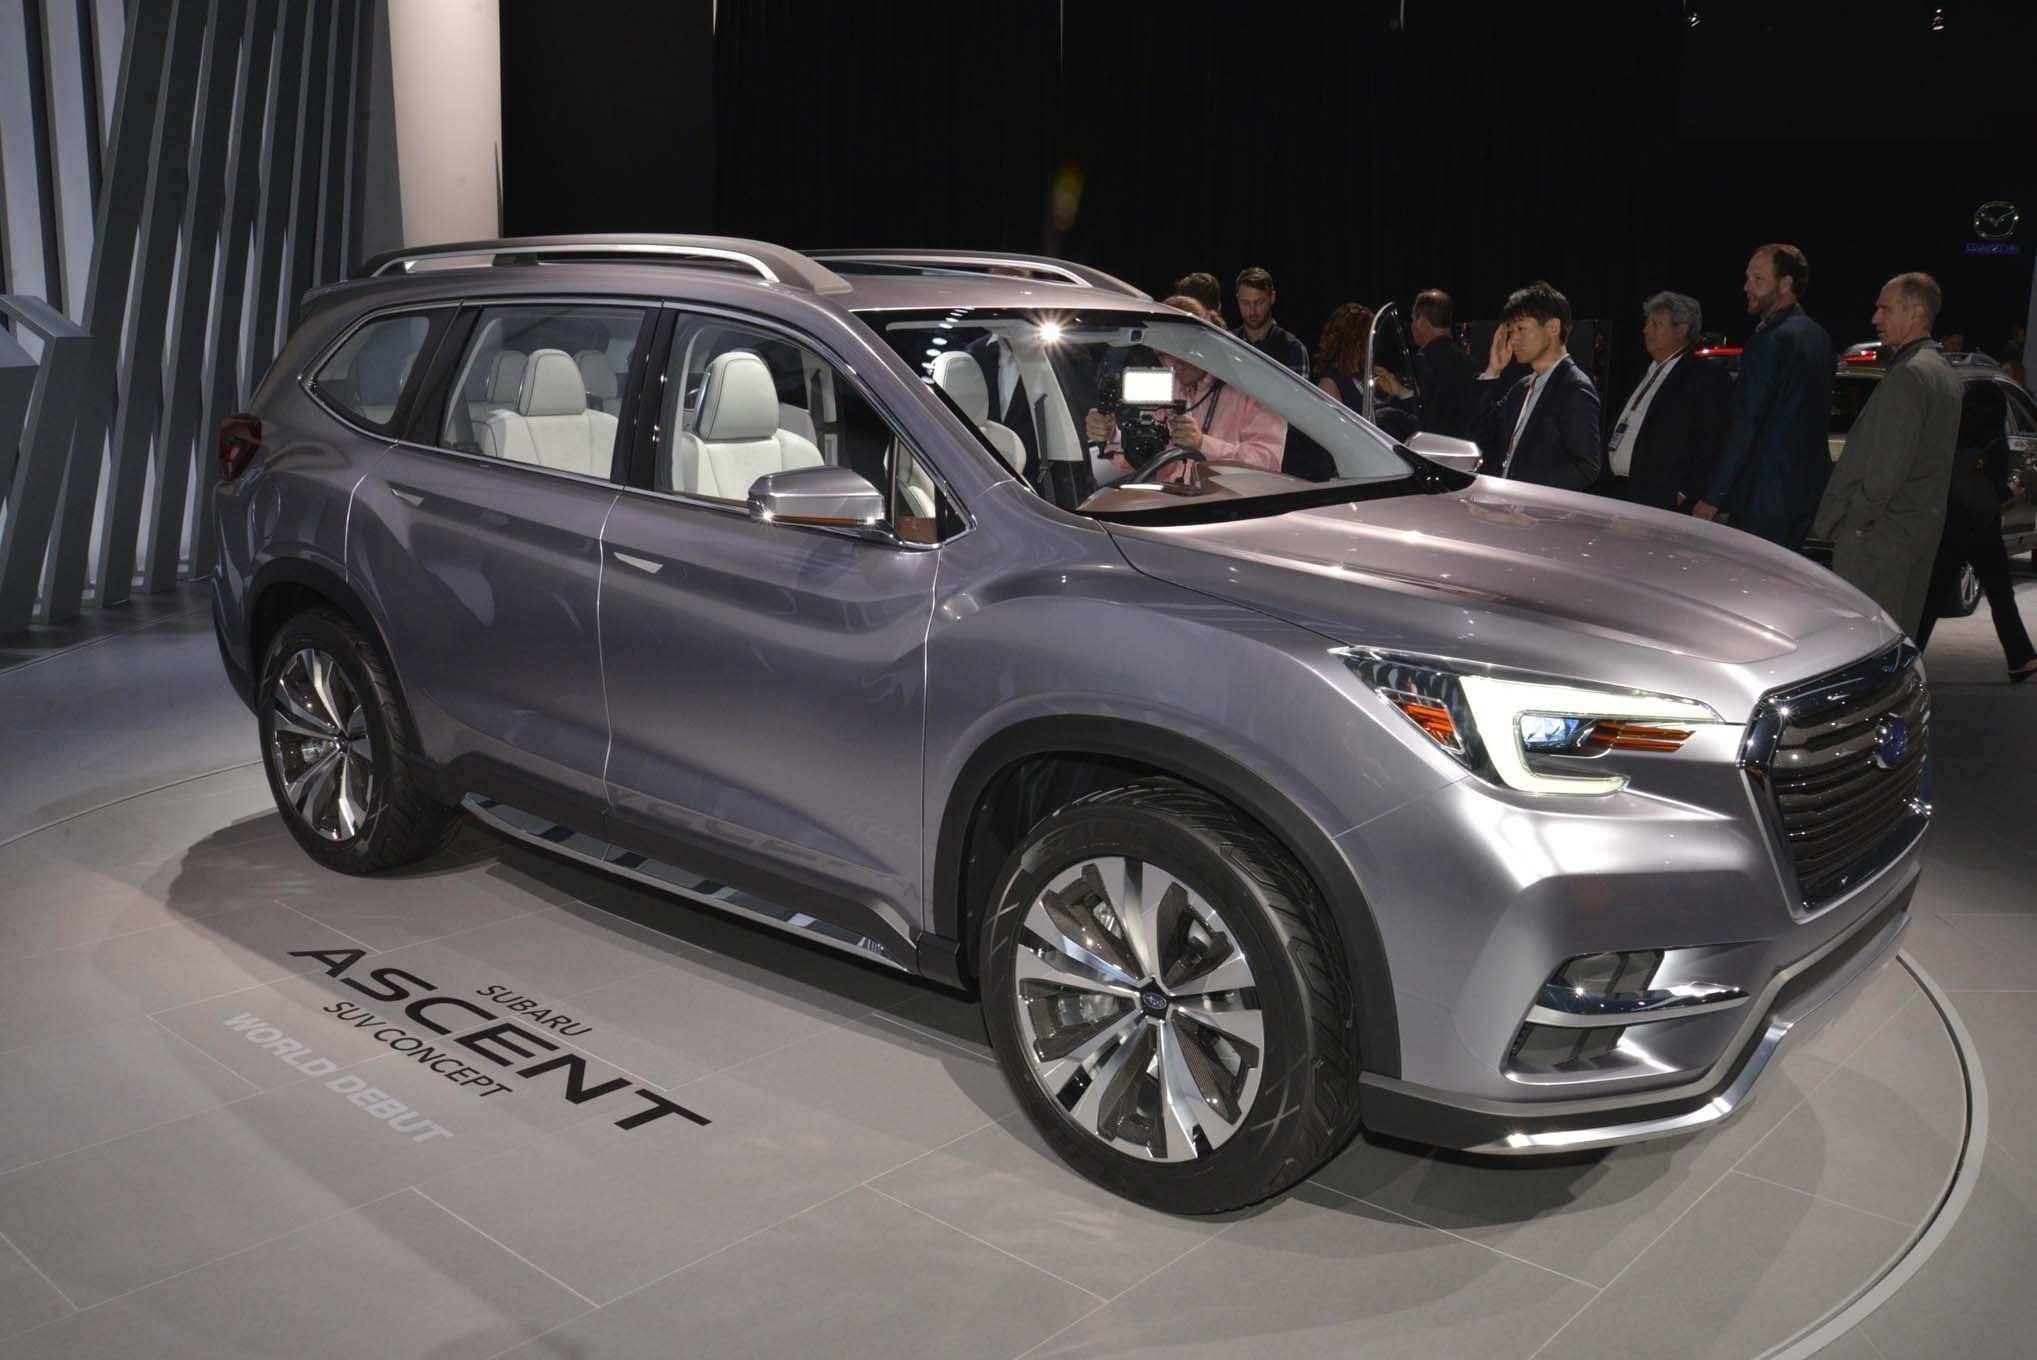 84 Gallery of New Subaru Cars 2019 Spy Shoot New Review with New Subaru Cars 2019 Spy Shoot